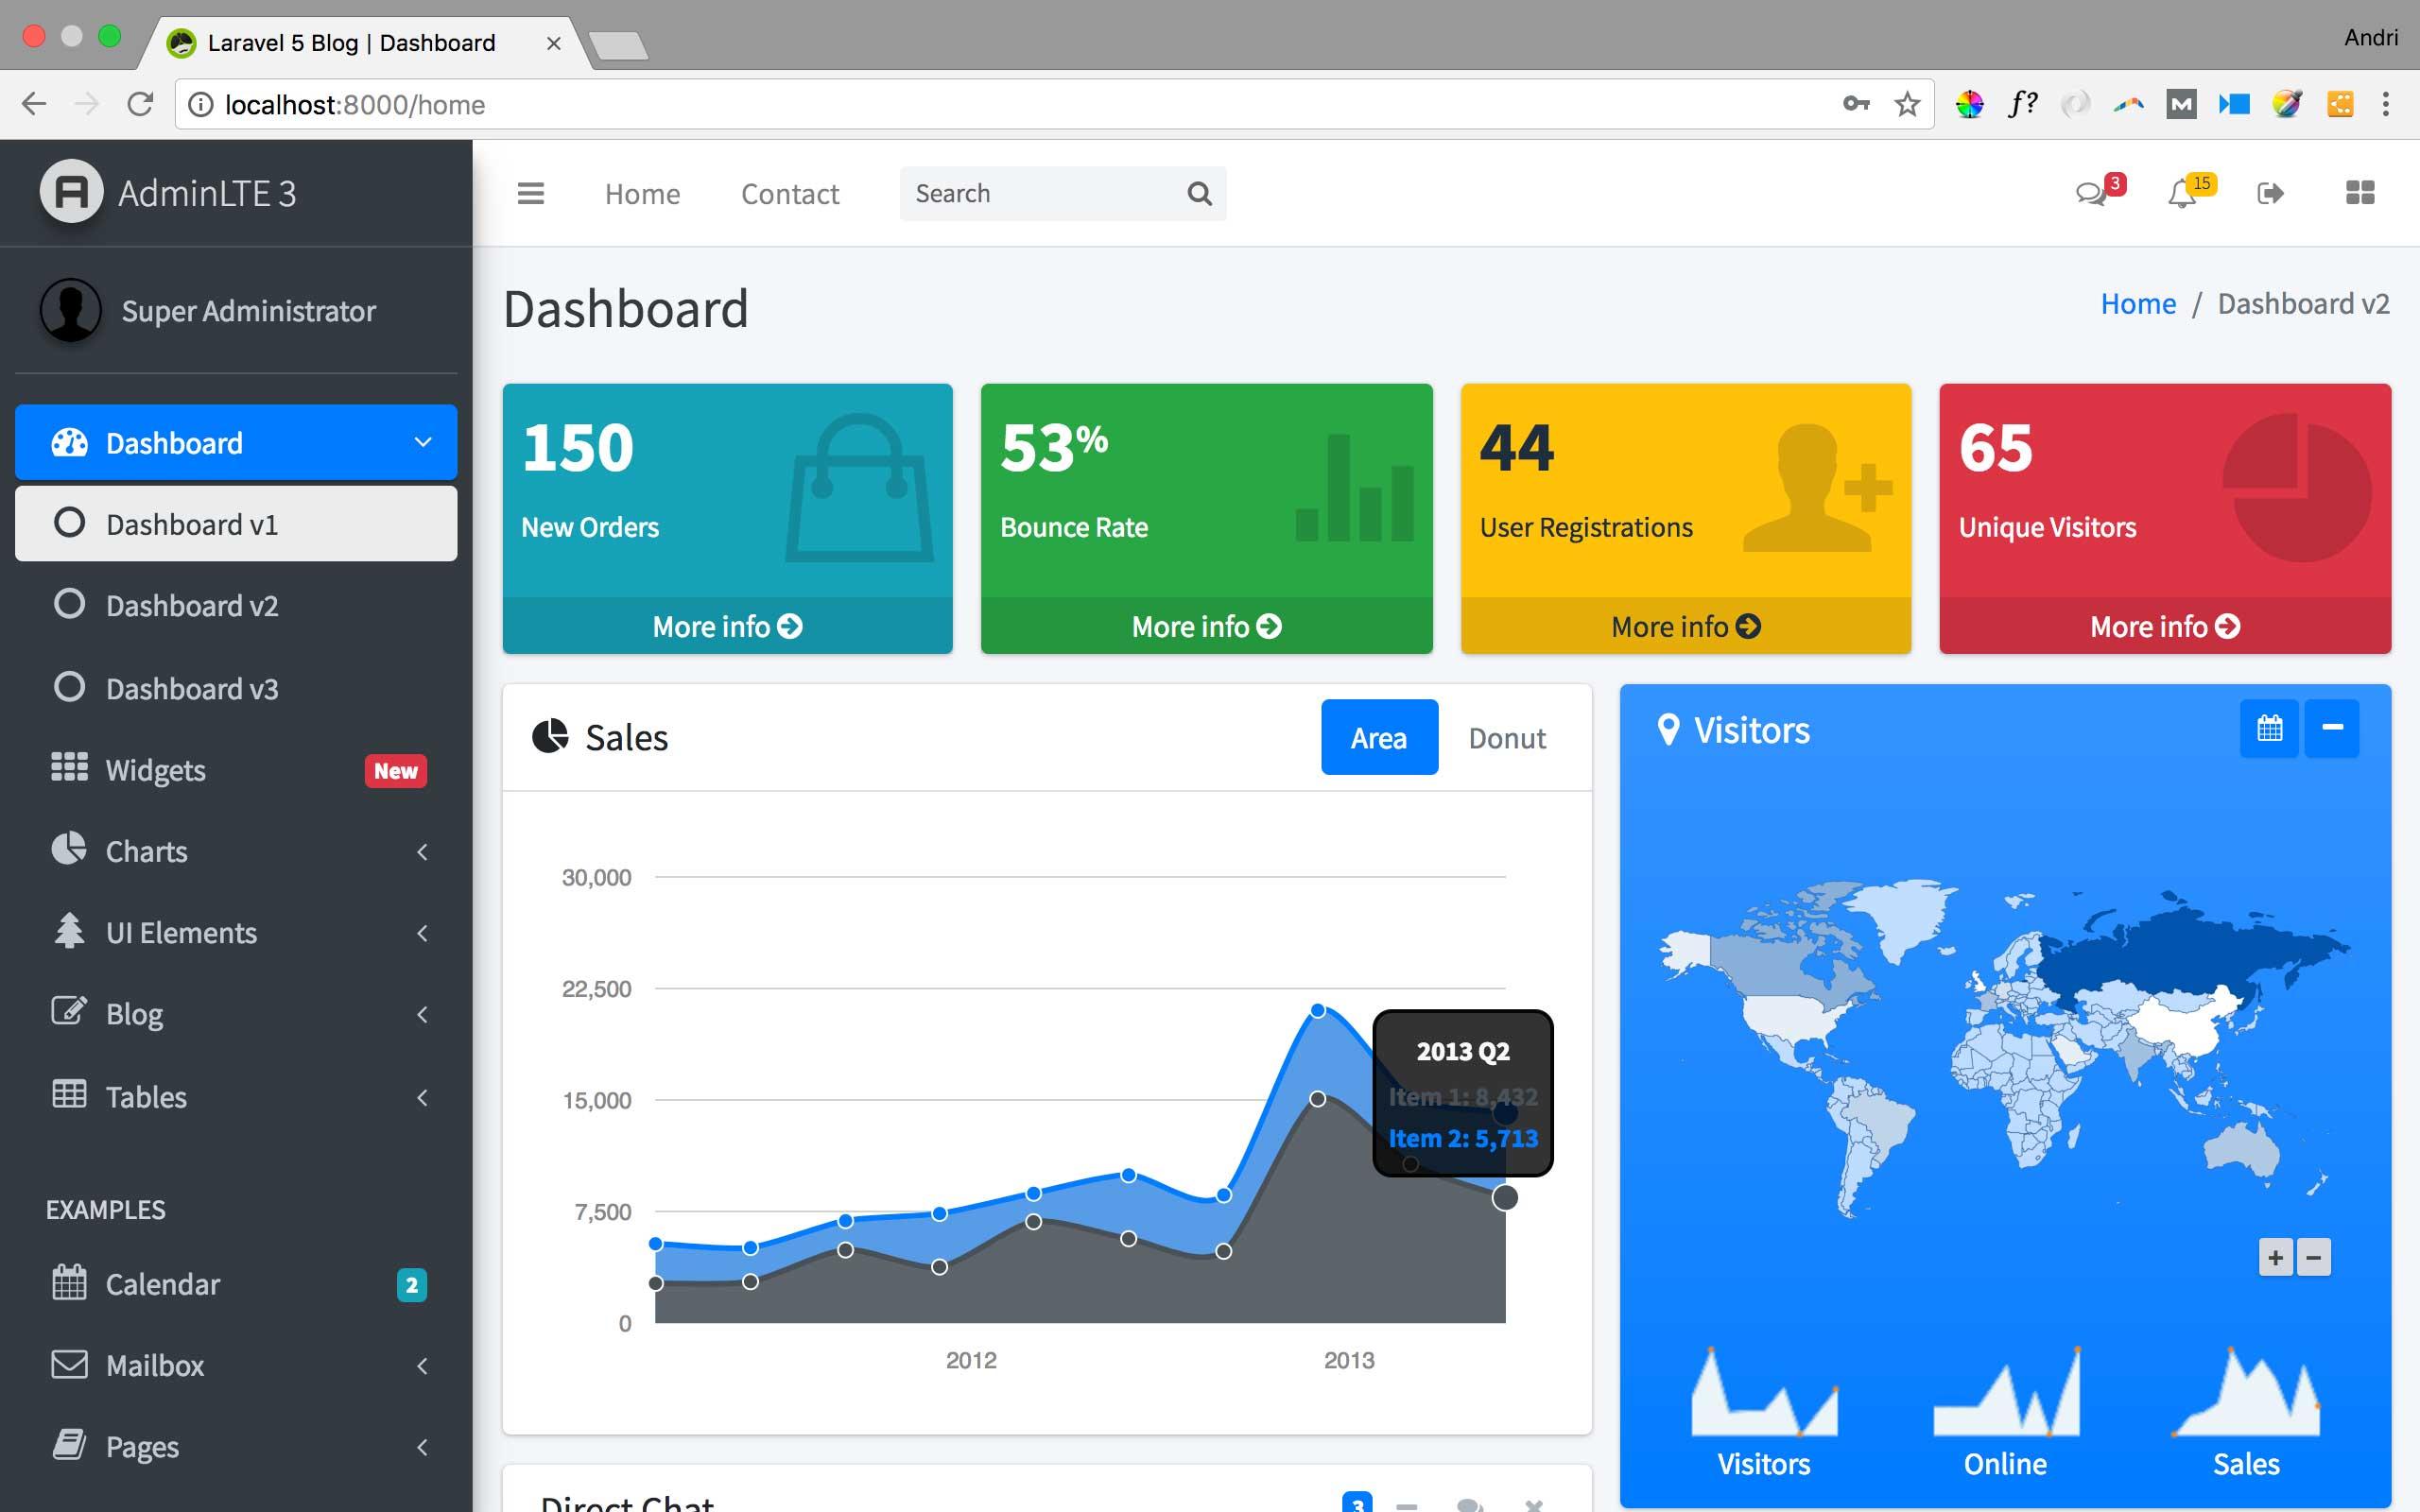 Membuat Blog dengan Laravel 5 7 dan AdminLTE 3 (9